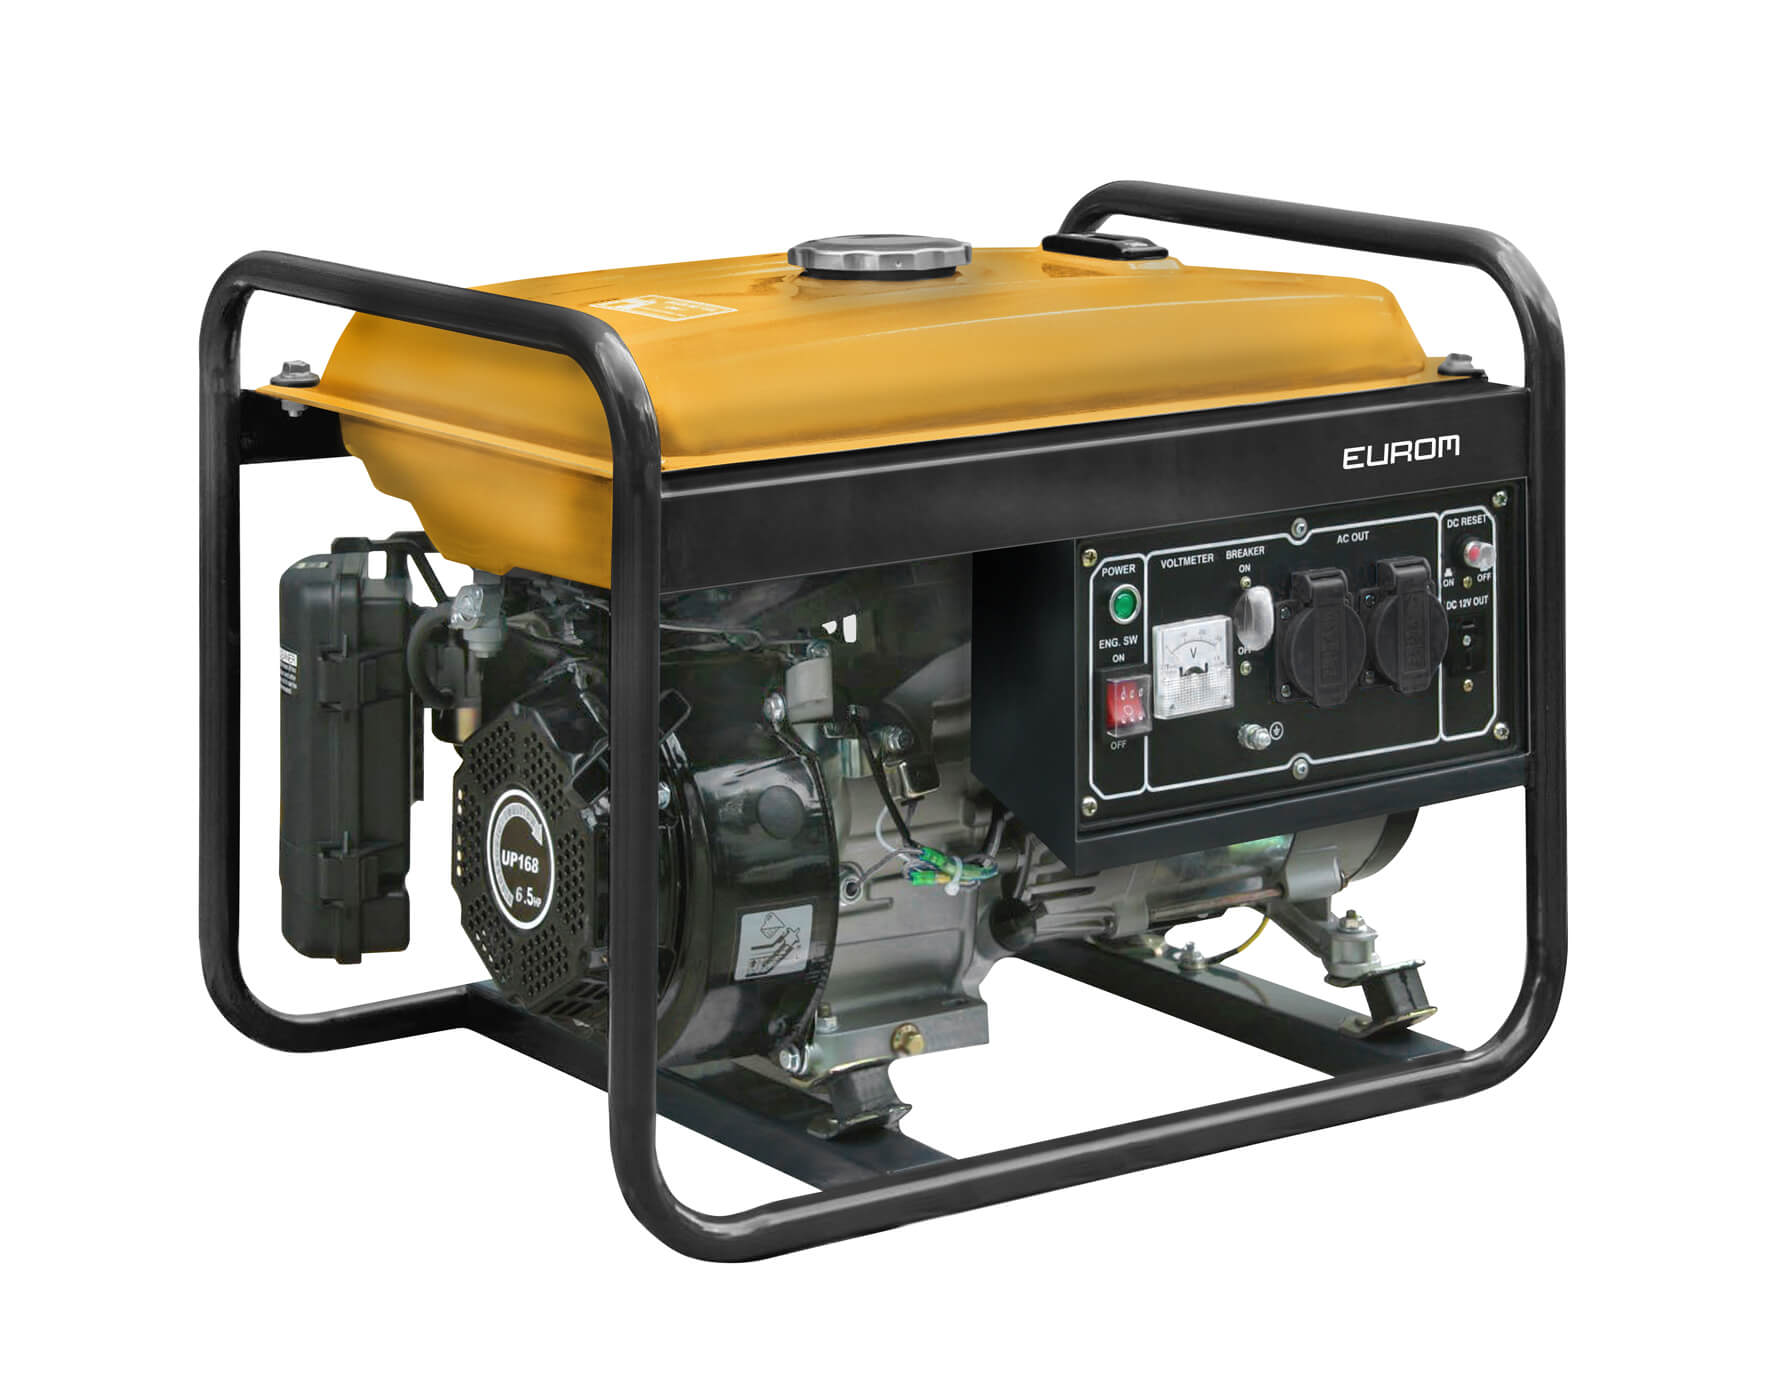 Eurom GE2501 Benzine generator 196cc | Aggregaat 2200W 230V